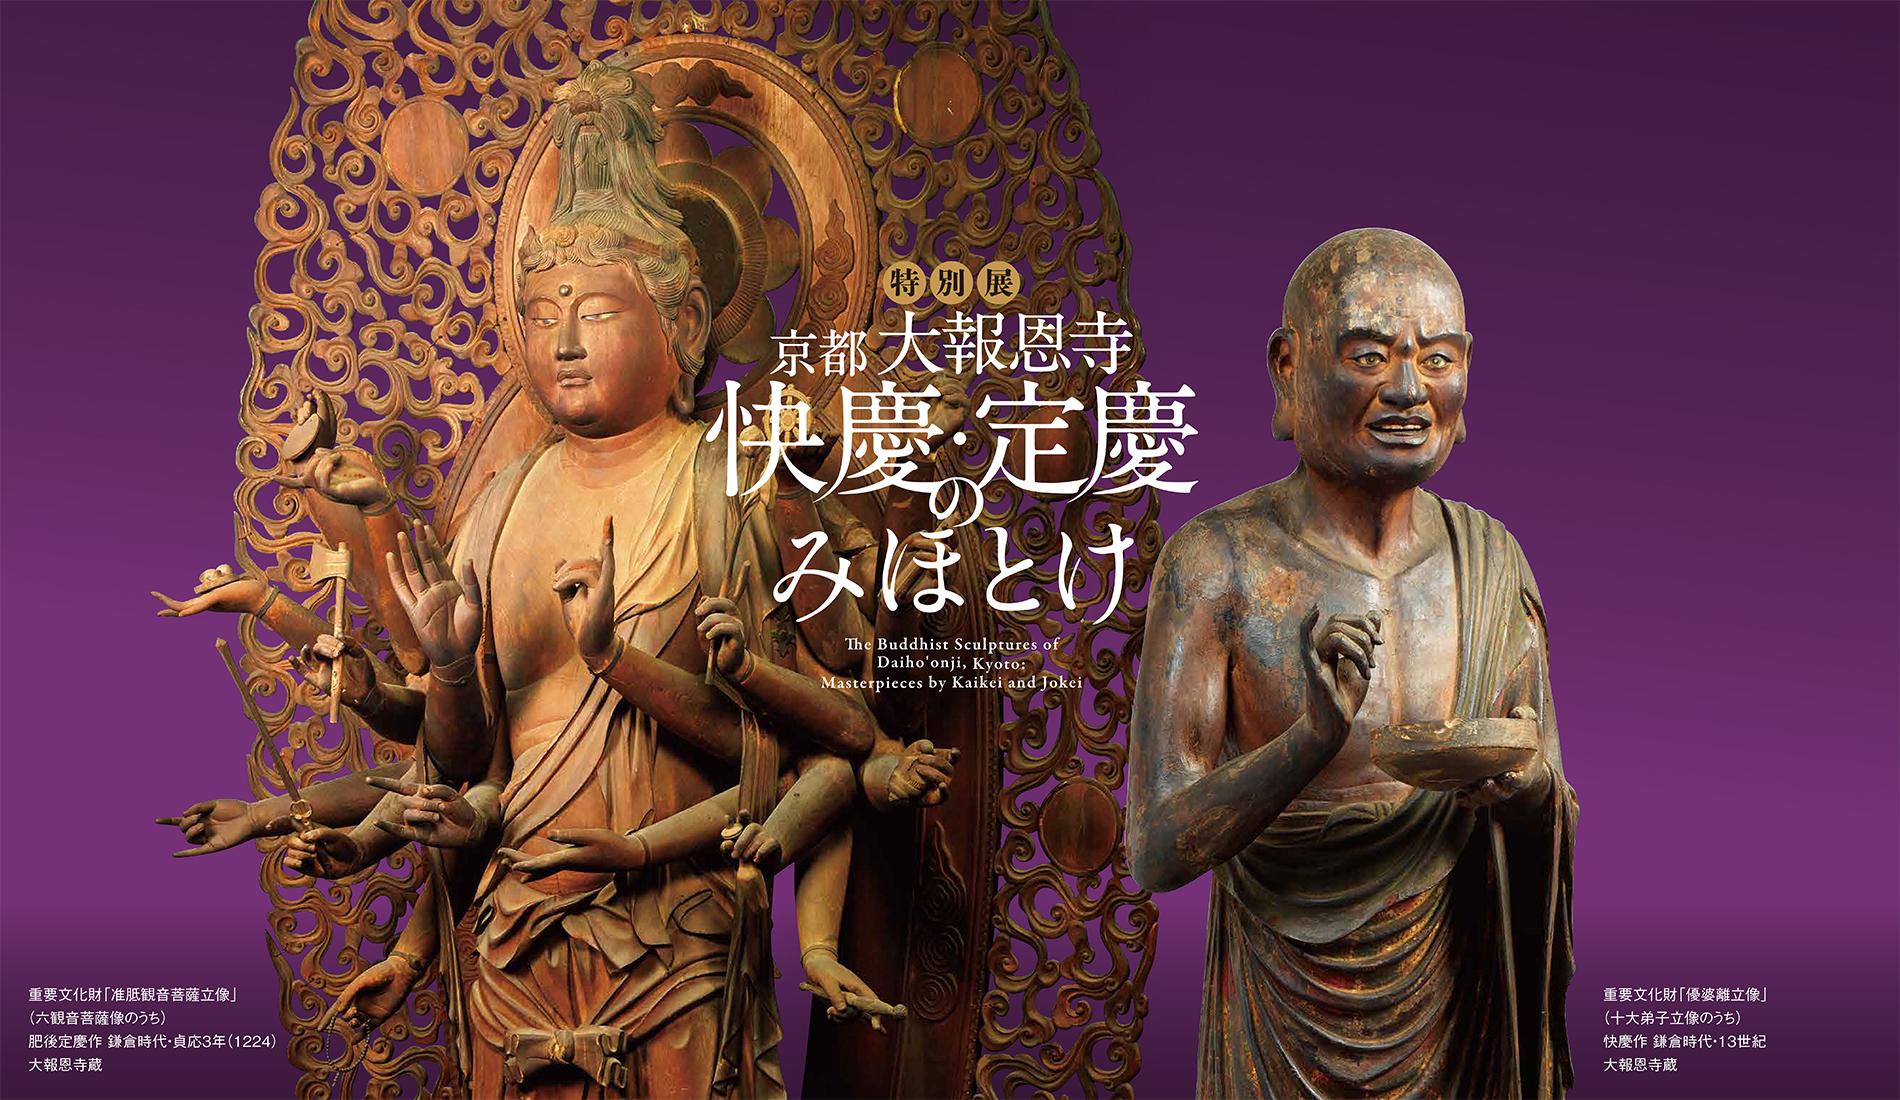 The Buddhist Sculptures of Daiho'onji, Kyoto: Masterpieces by Kaikei and Jokei